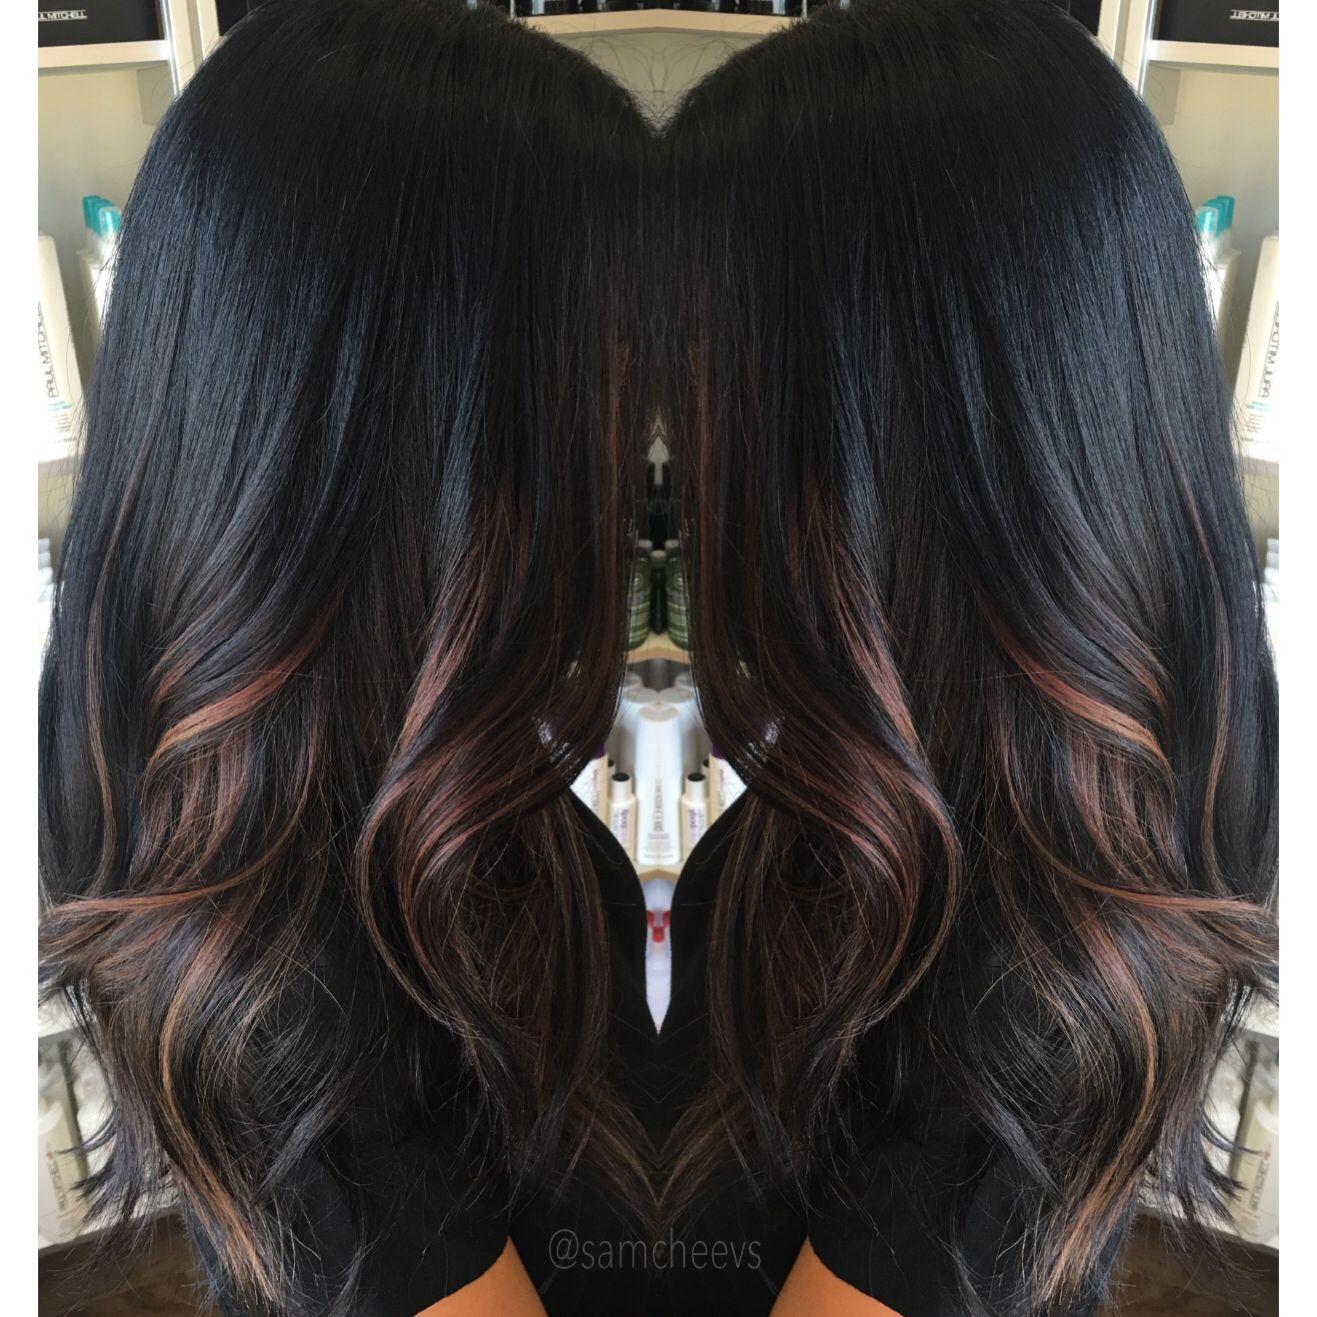 Highlights for black hair | Hair Tips & Hair Care in 2019 ...